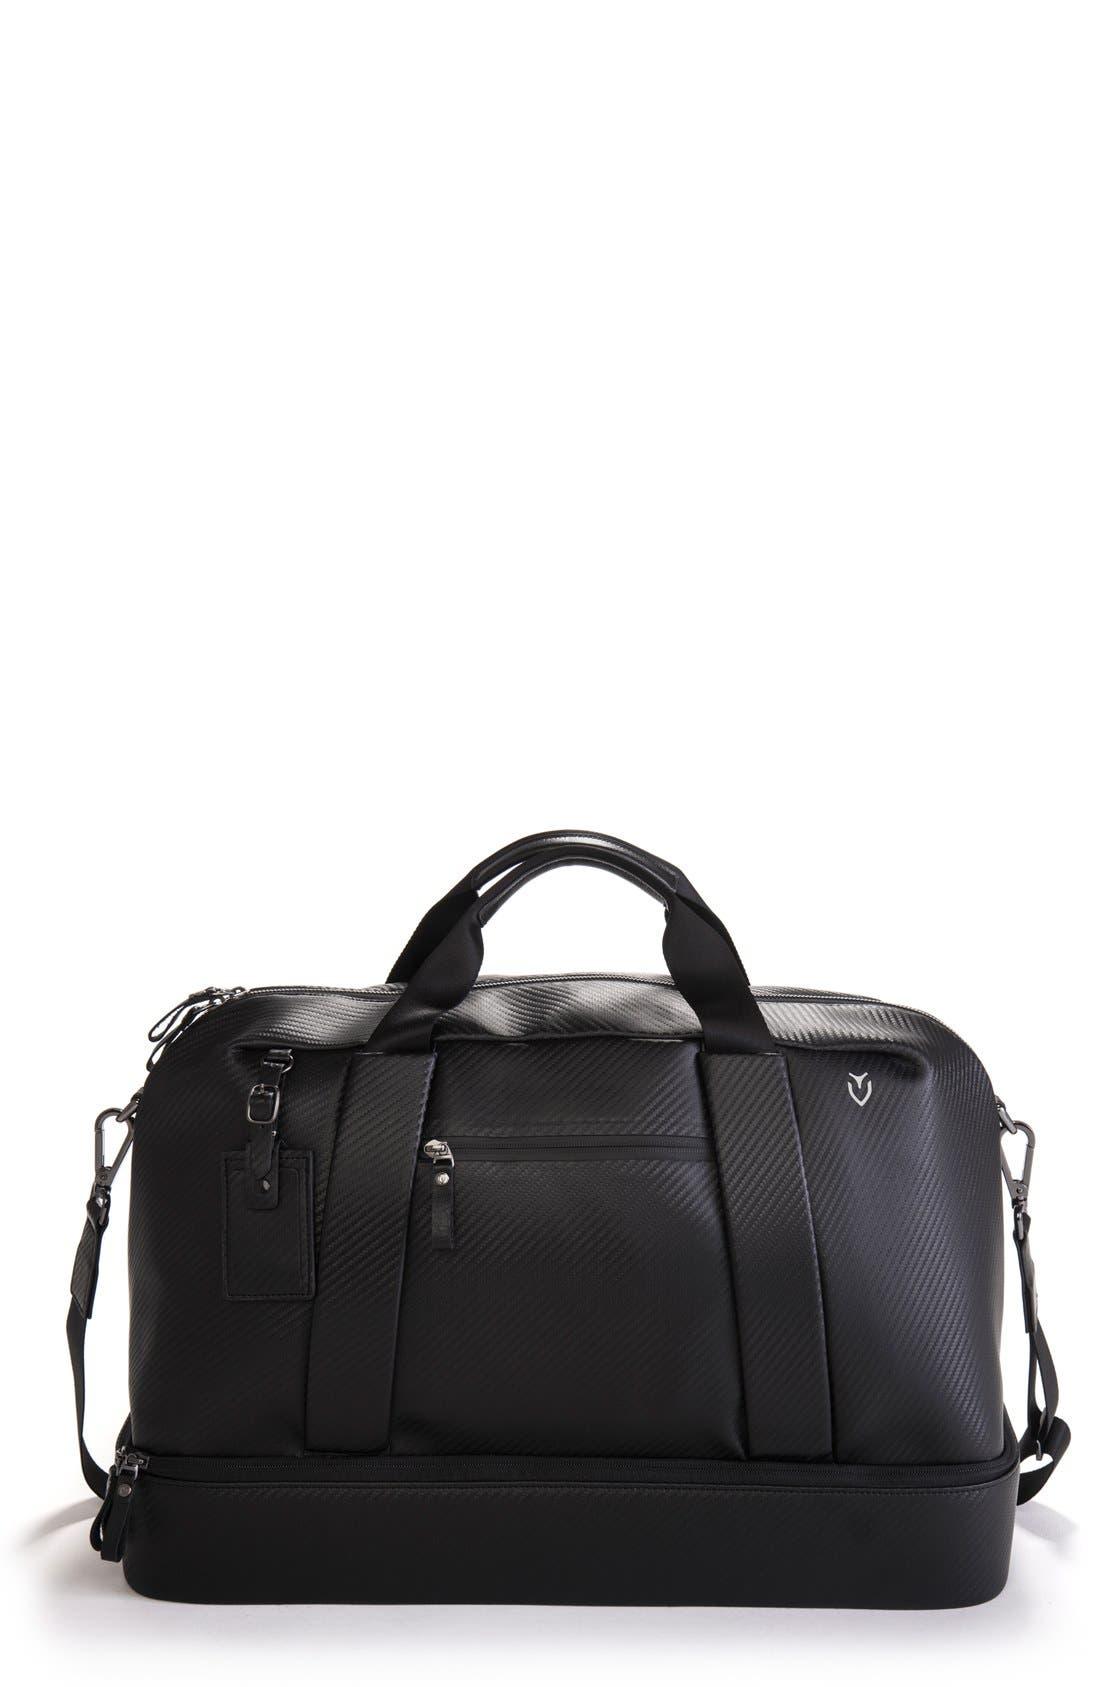 Main Image - Vessel Signature Large Boston Duffel Bag